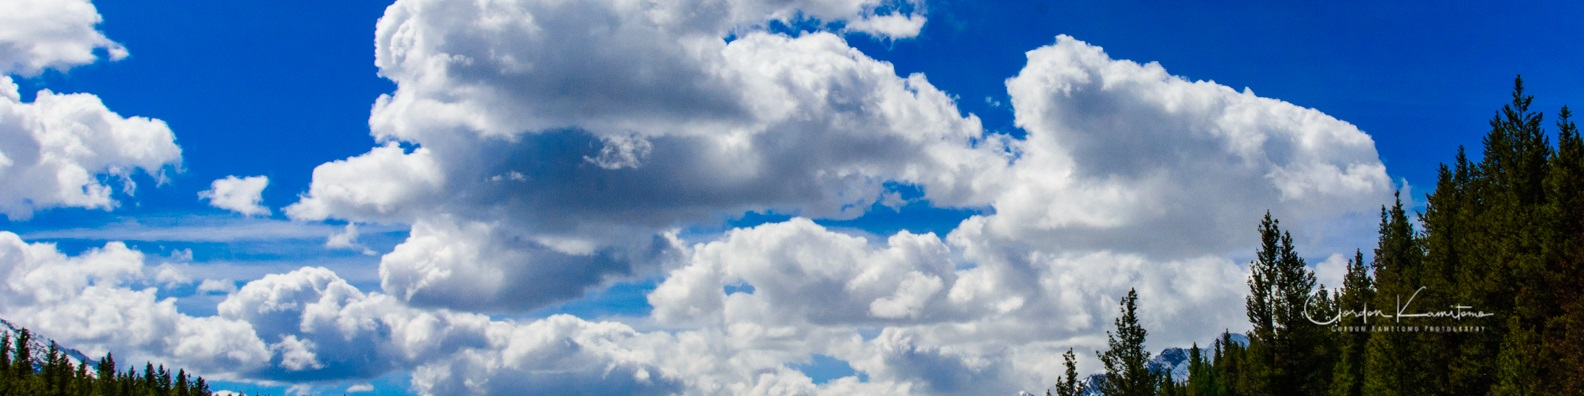 Linkedin Banner Clouds